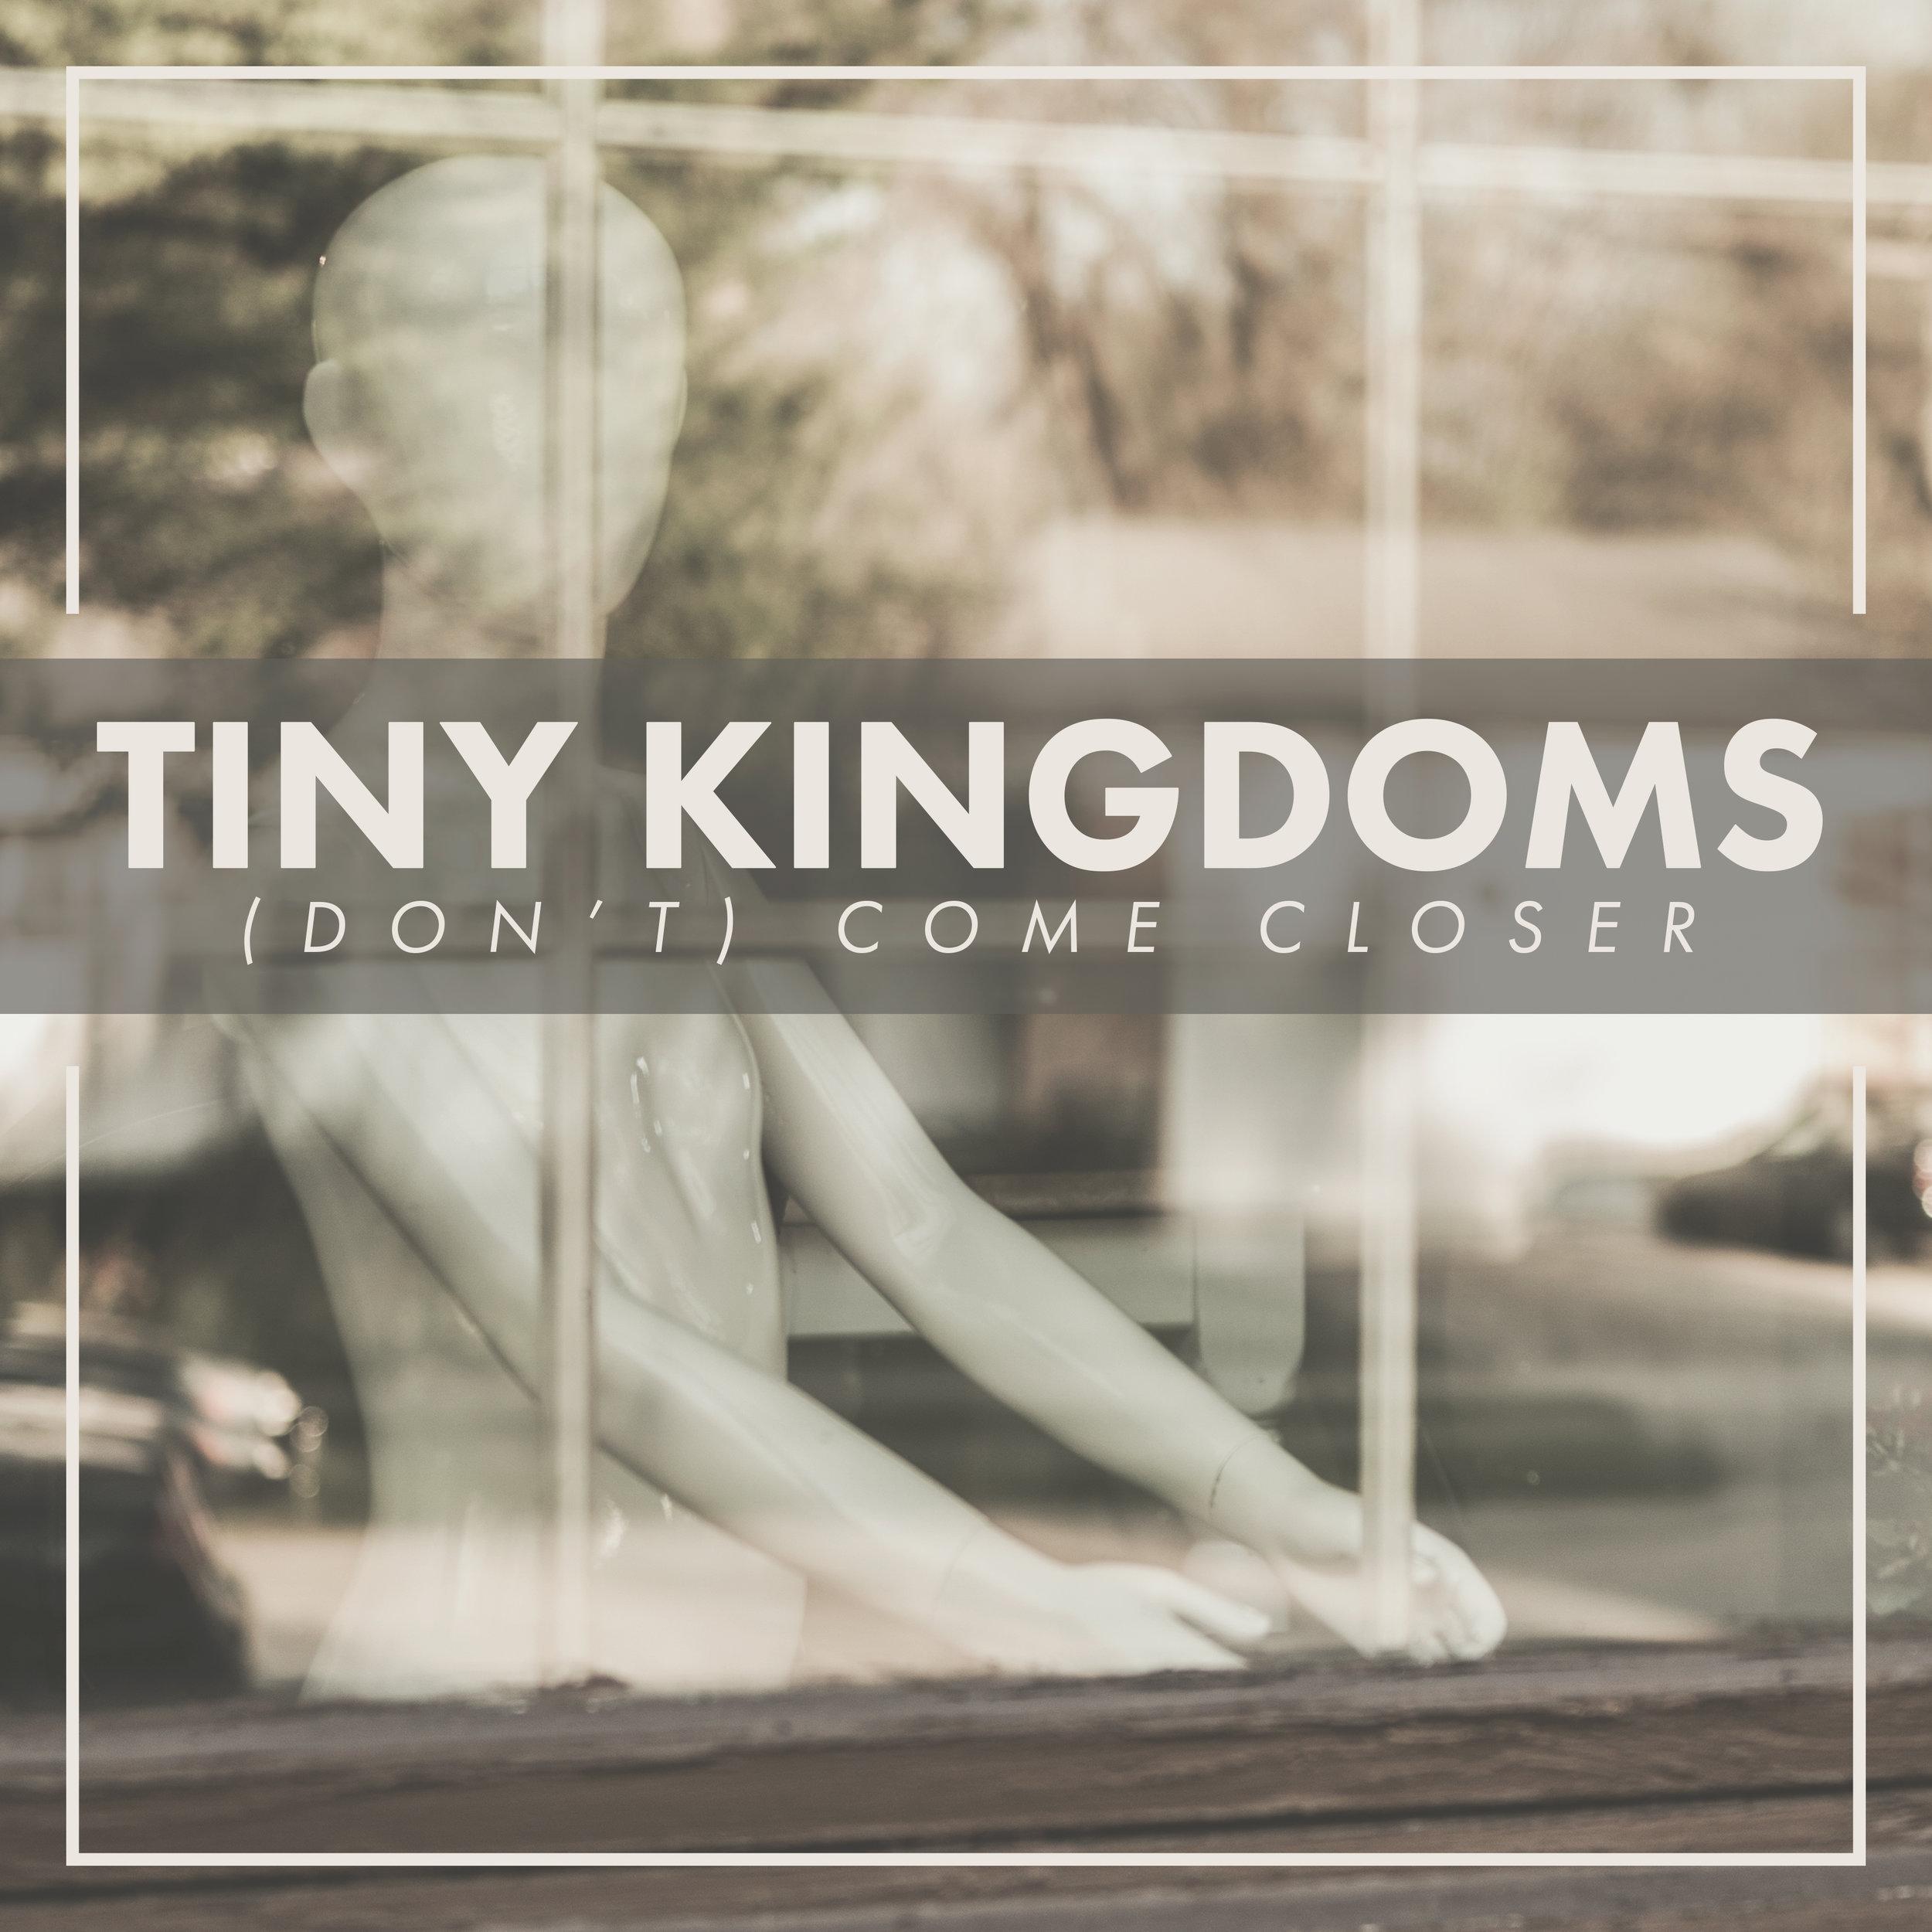 TinyKingdoms-DontComeCloser-AA-Look1-AZ.jpg